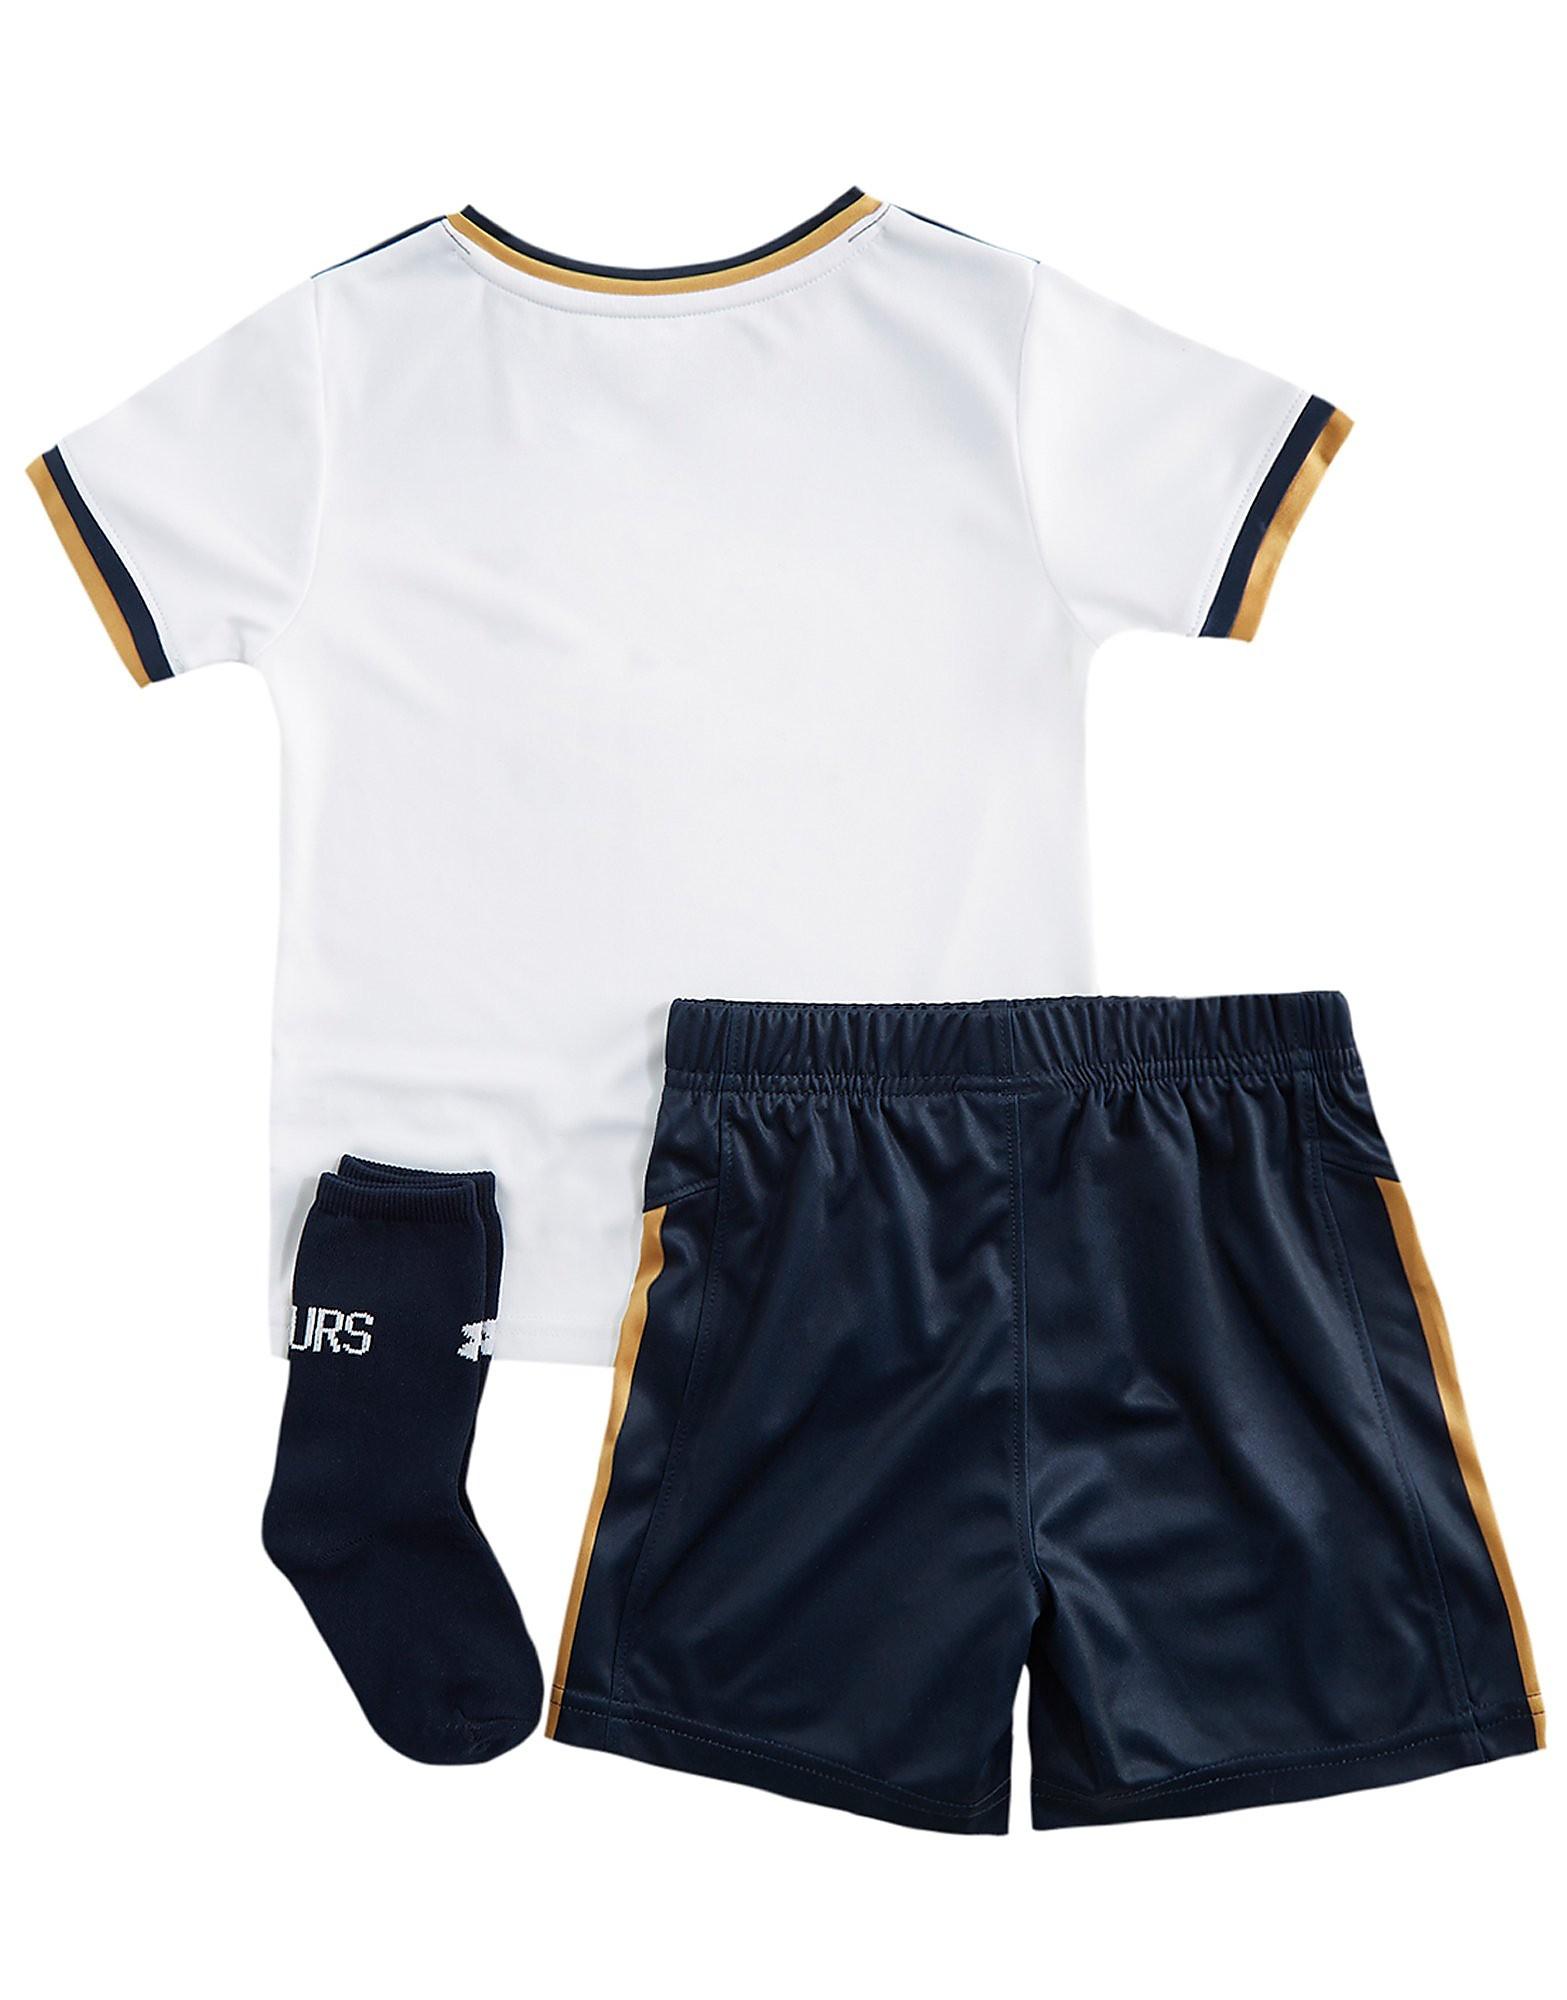 Under Armour Tottenham Hotspur FC 2016/17 Home Kit Children